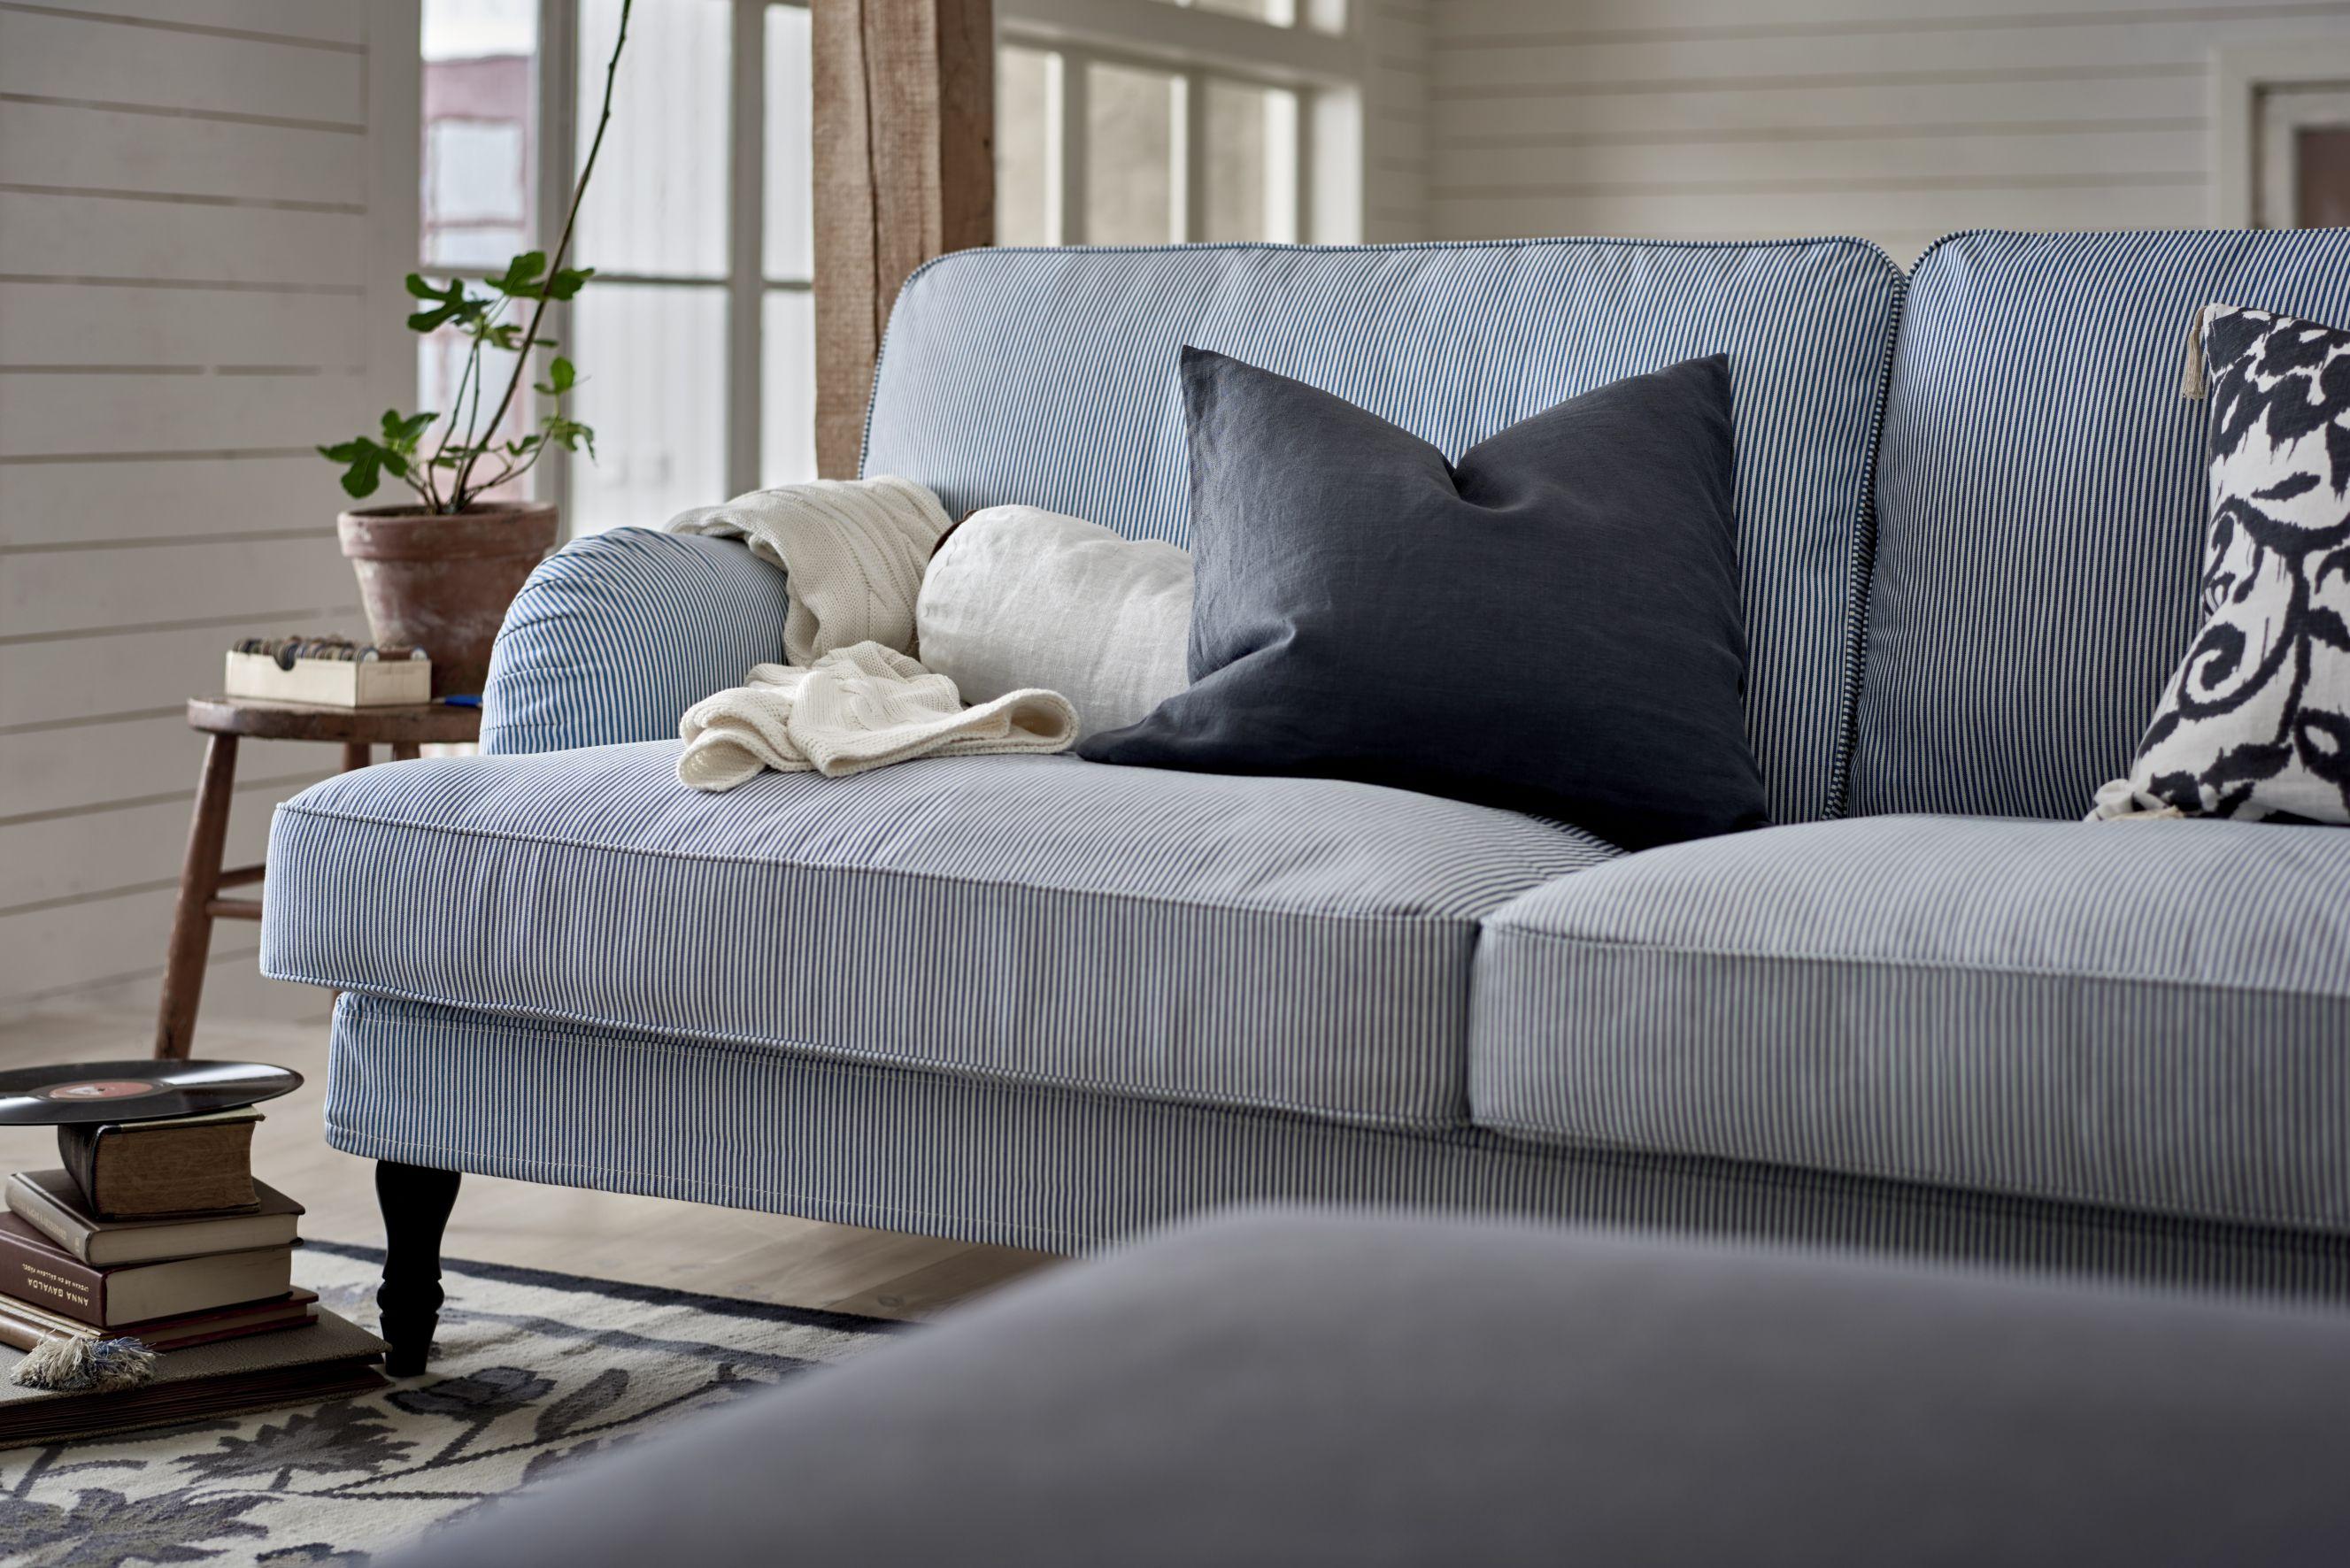 5 Golden Rules For Choosing A Sofa - Sofa Buying Guide